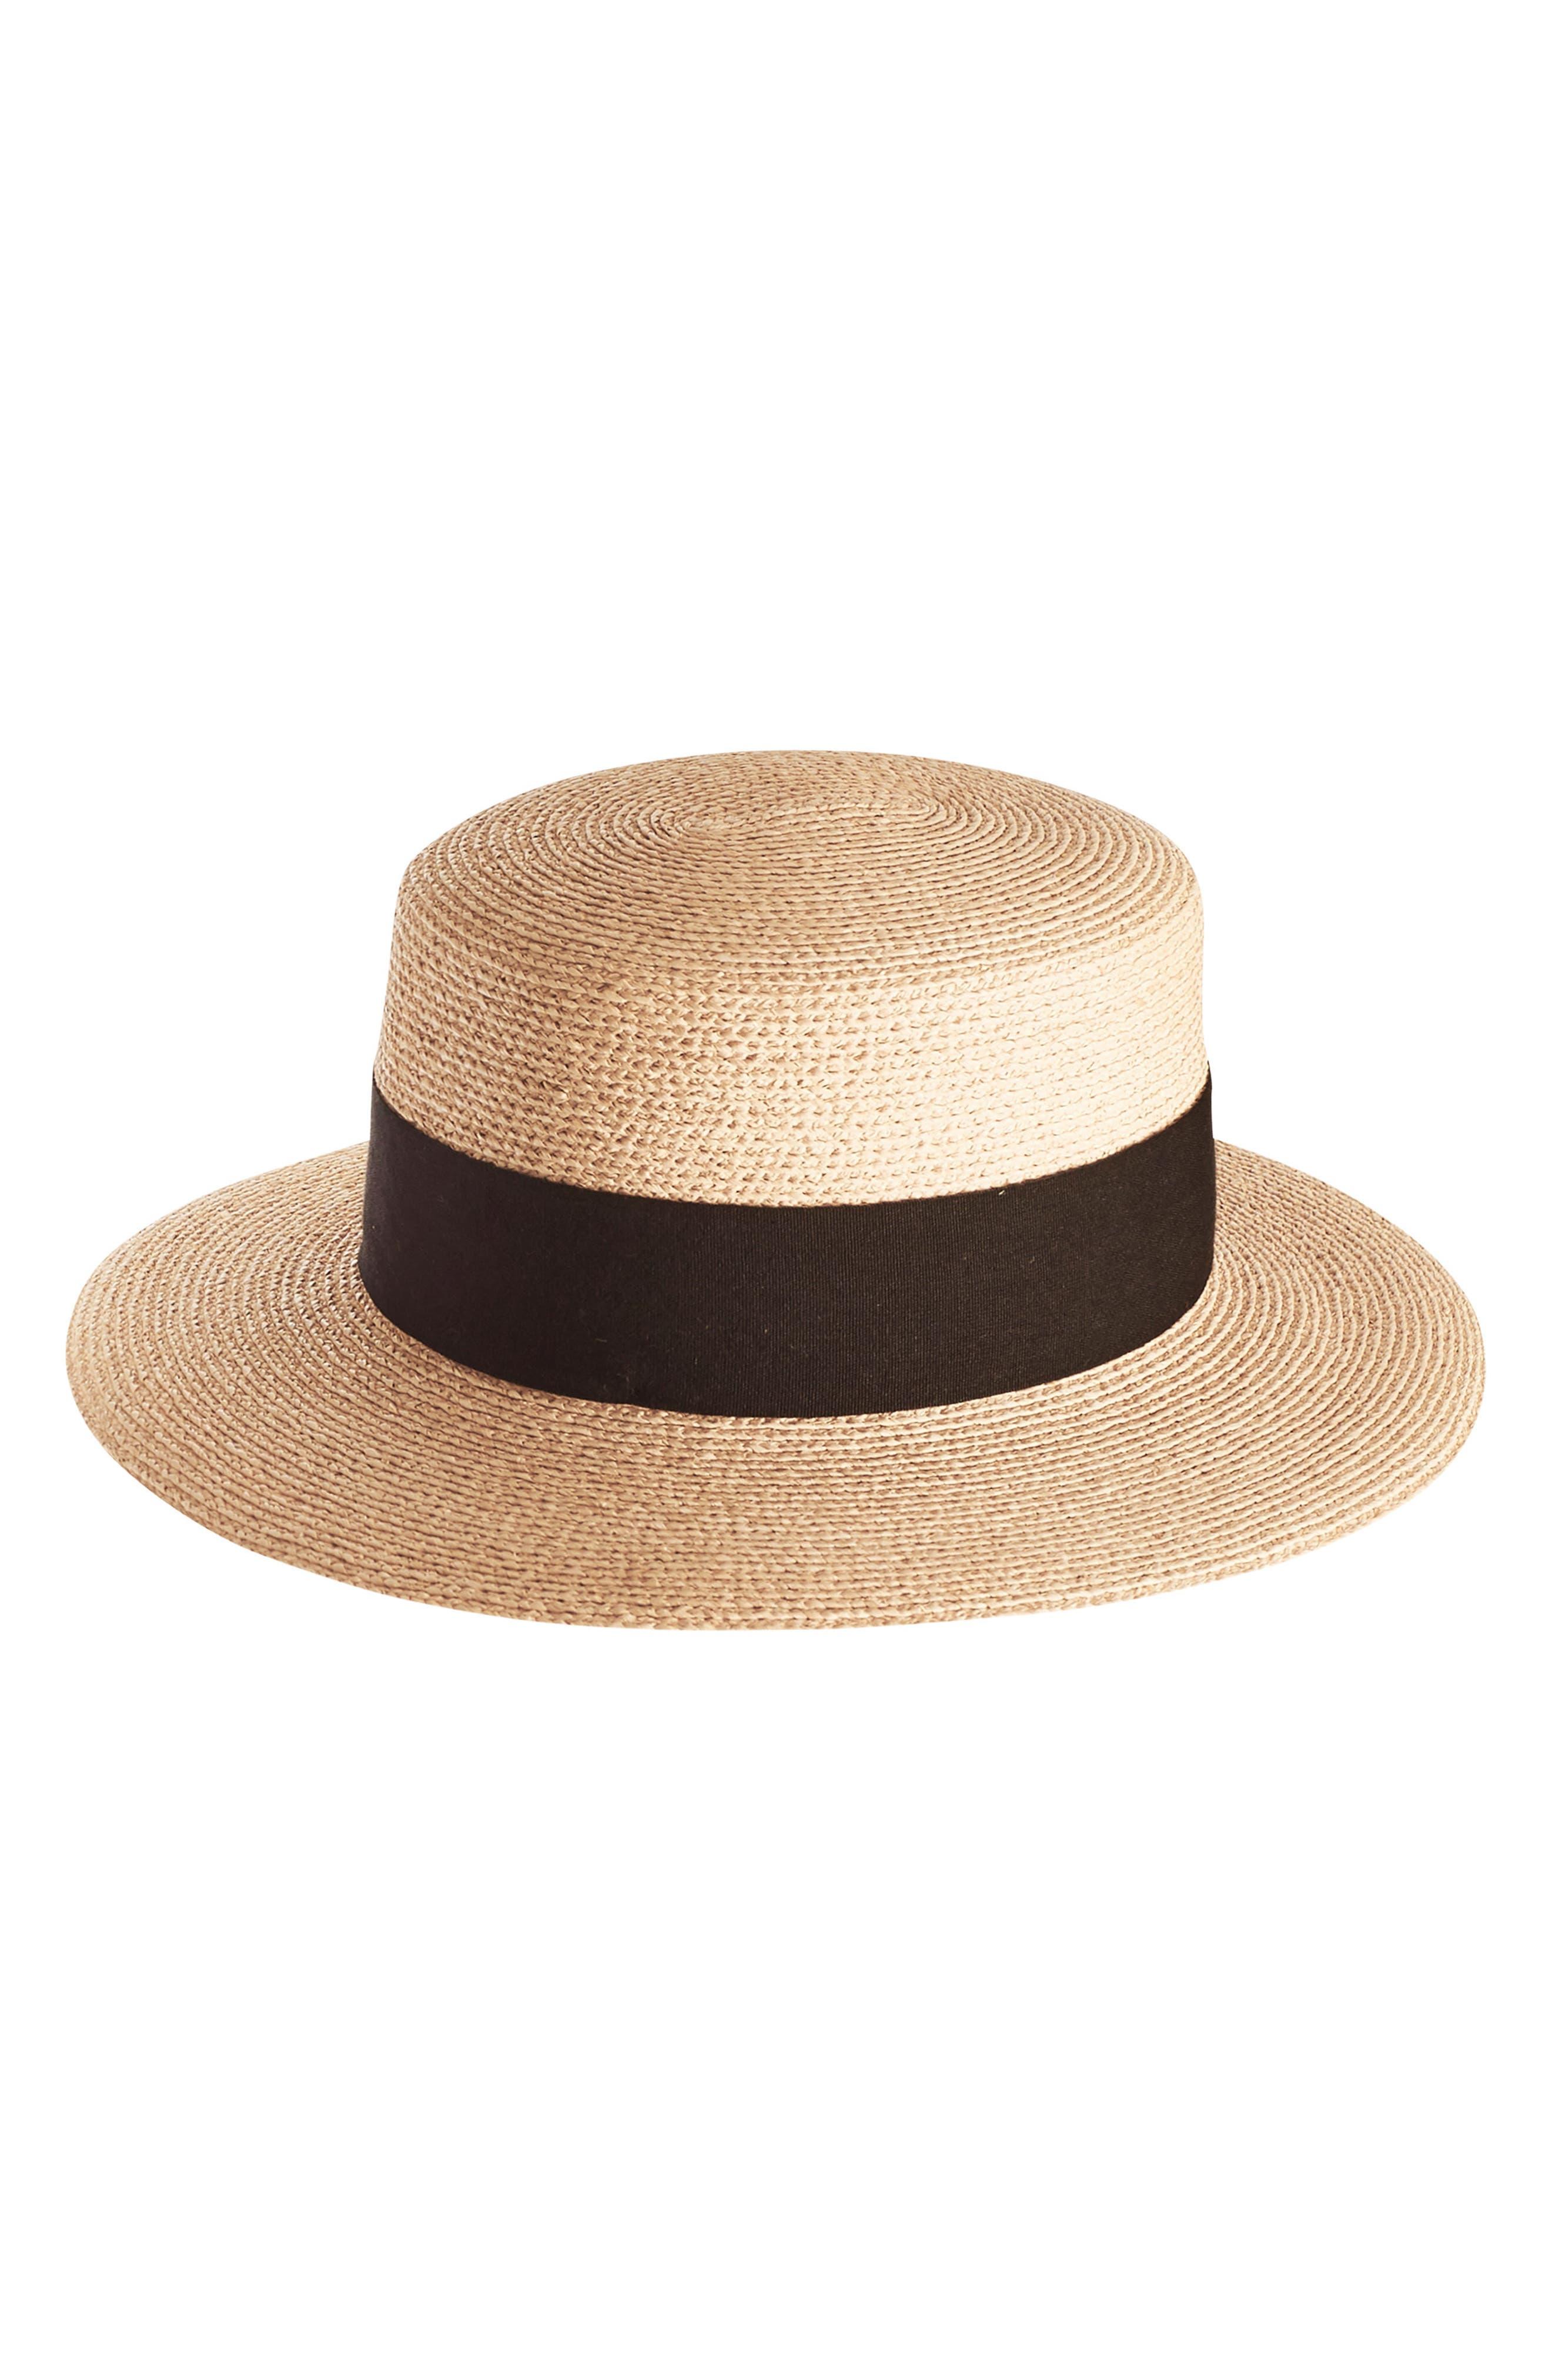 Braided Raffia Boater Hat,                         Main,                         color, Natural/ Black